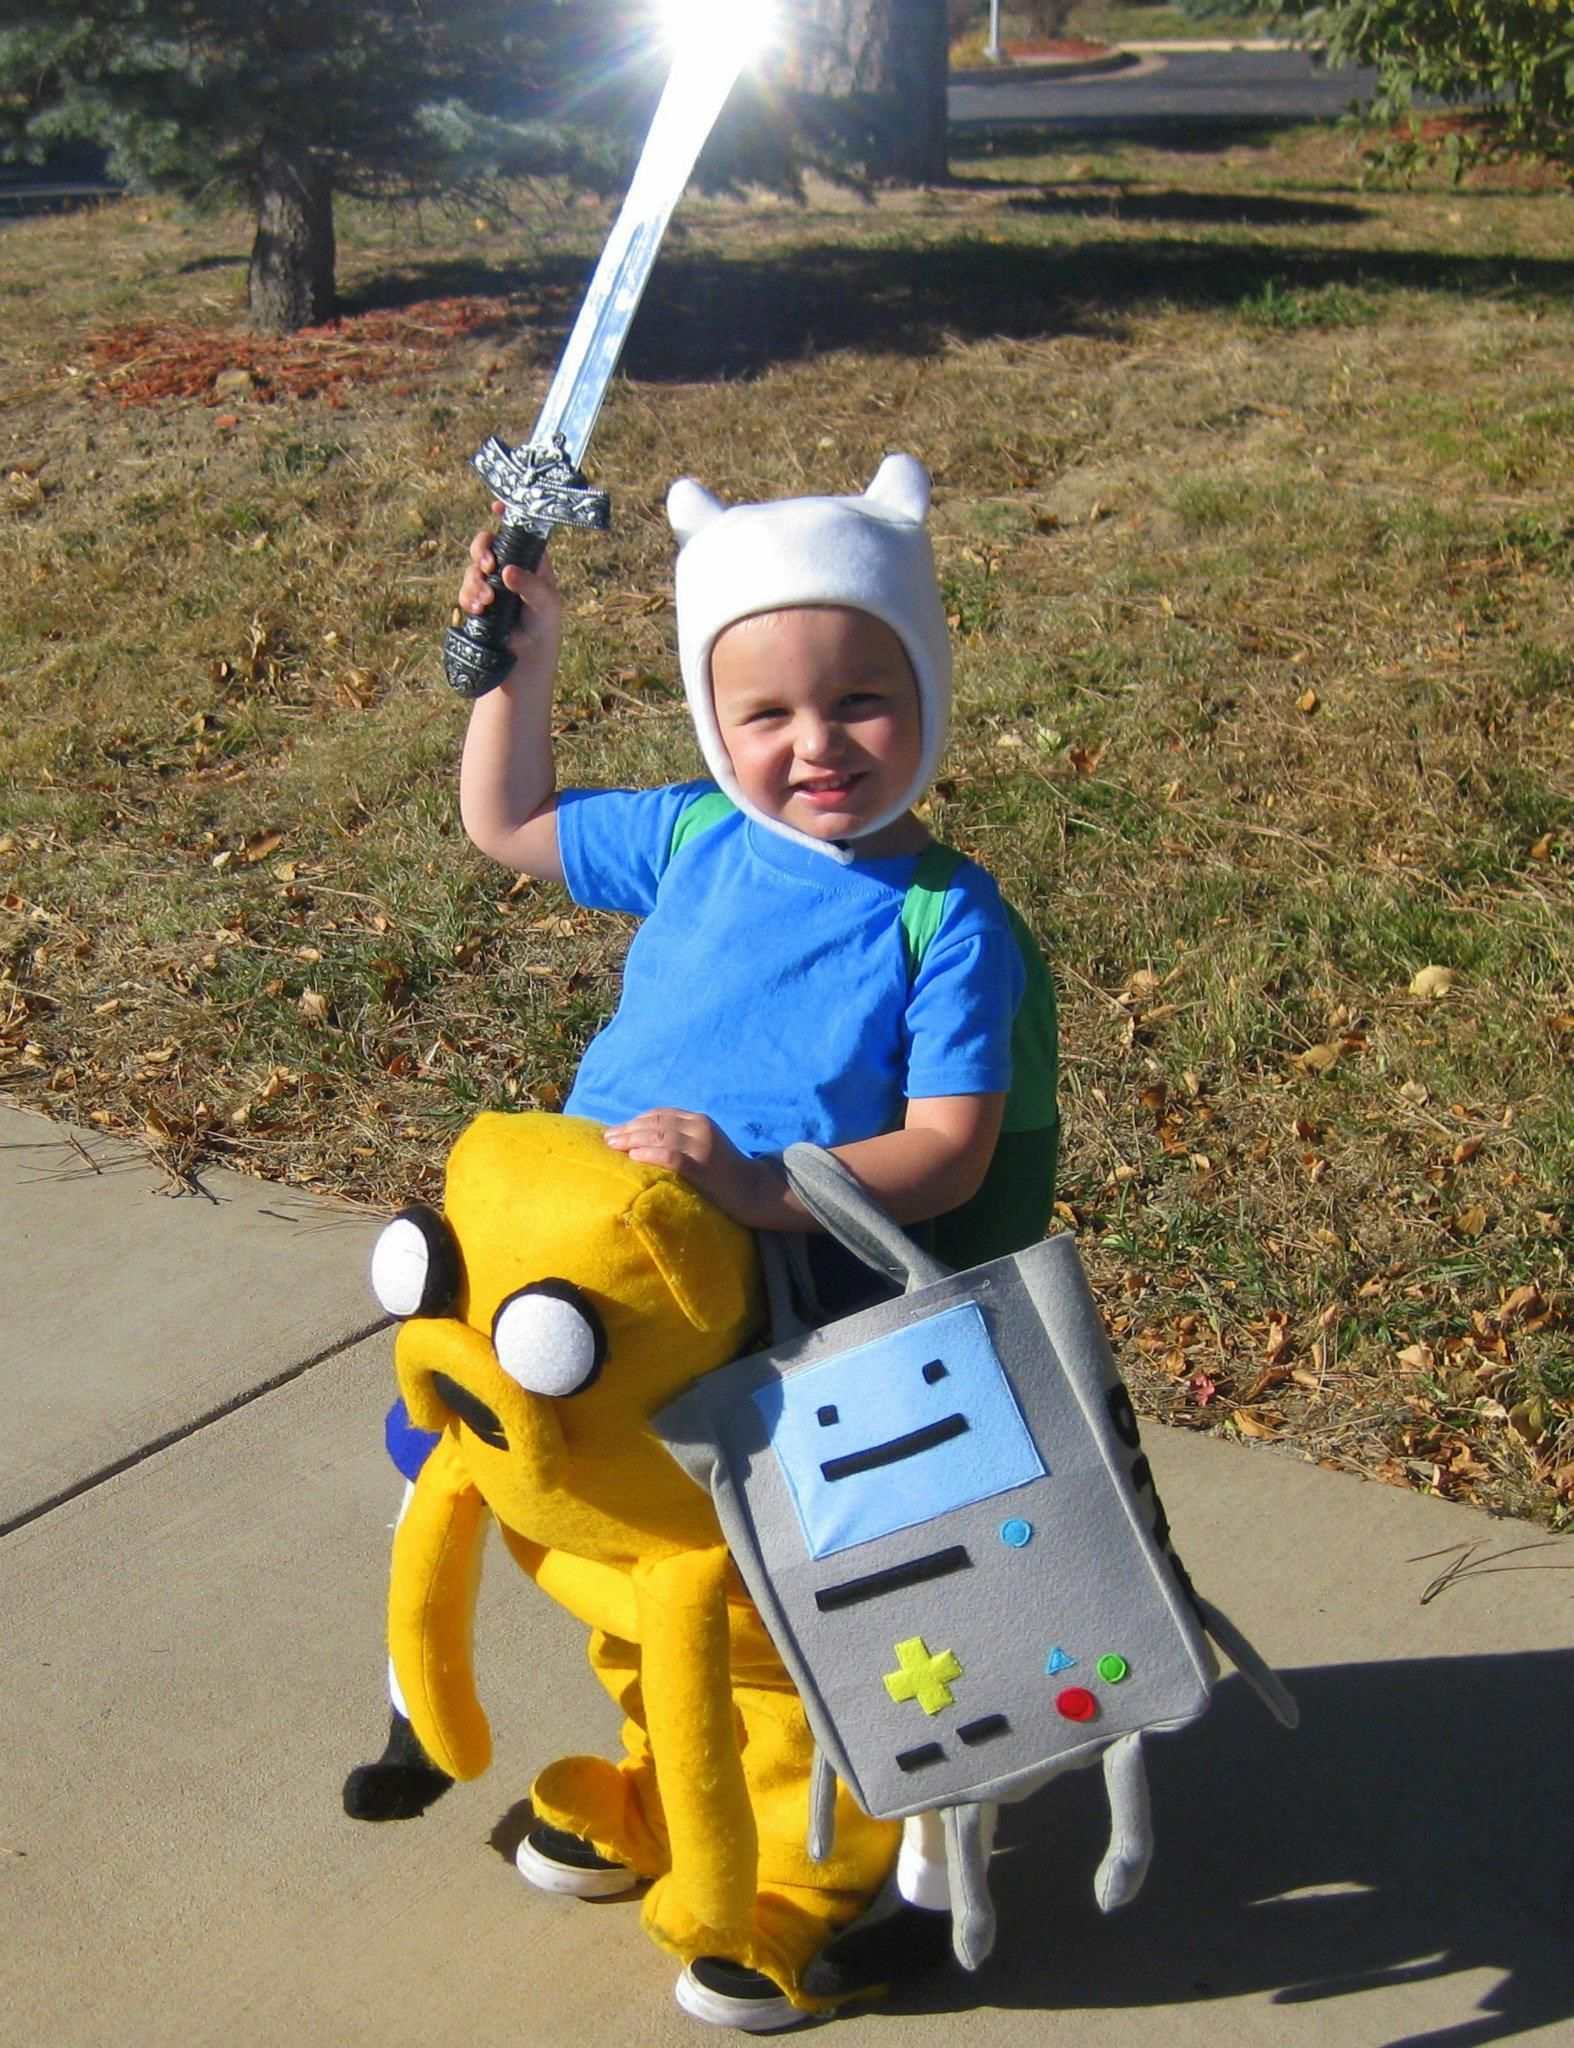 DIY Adventure Time costume - Finn, Jake, and BMO DUDE!!! LOL